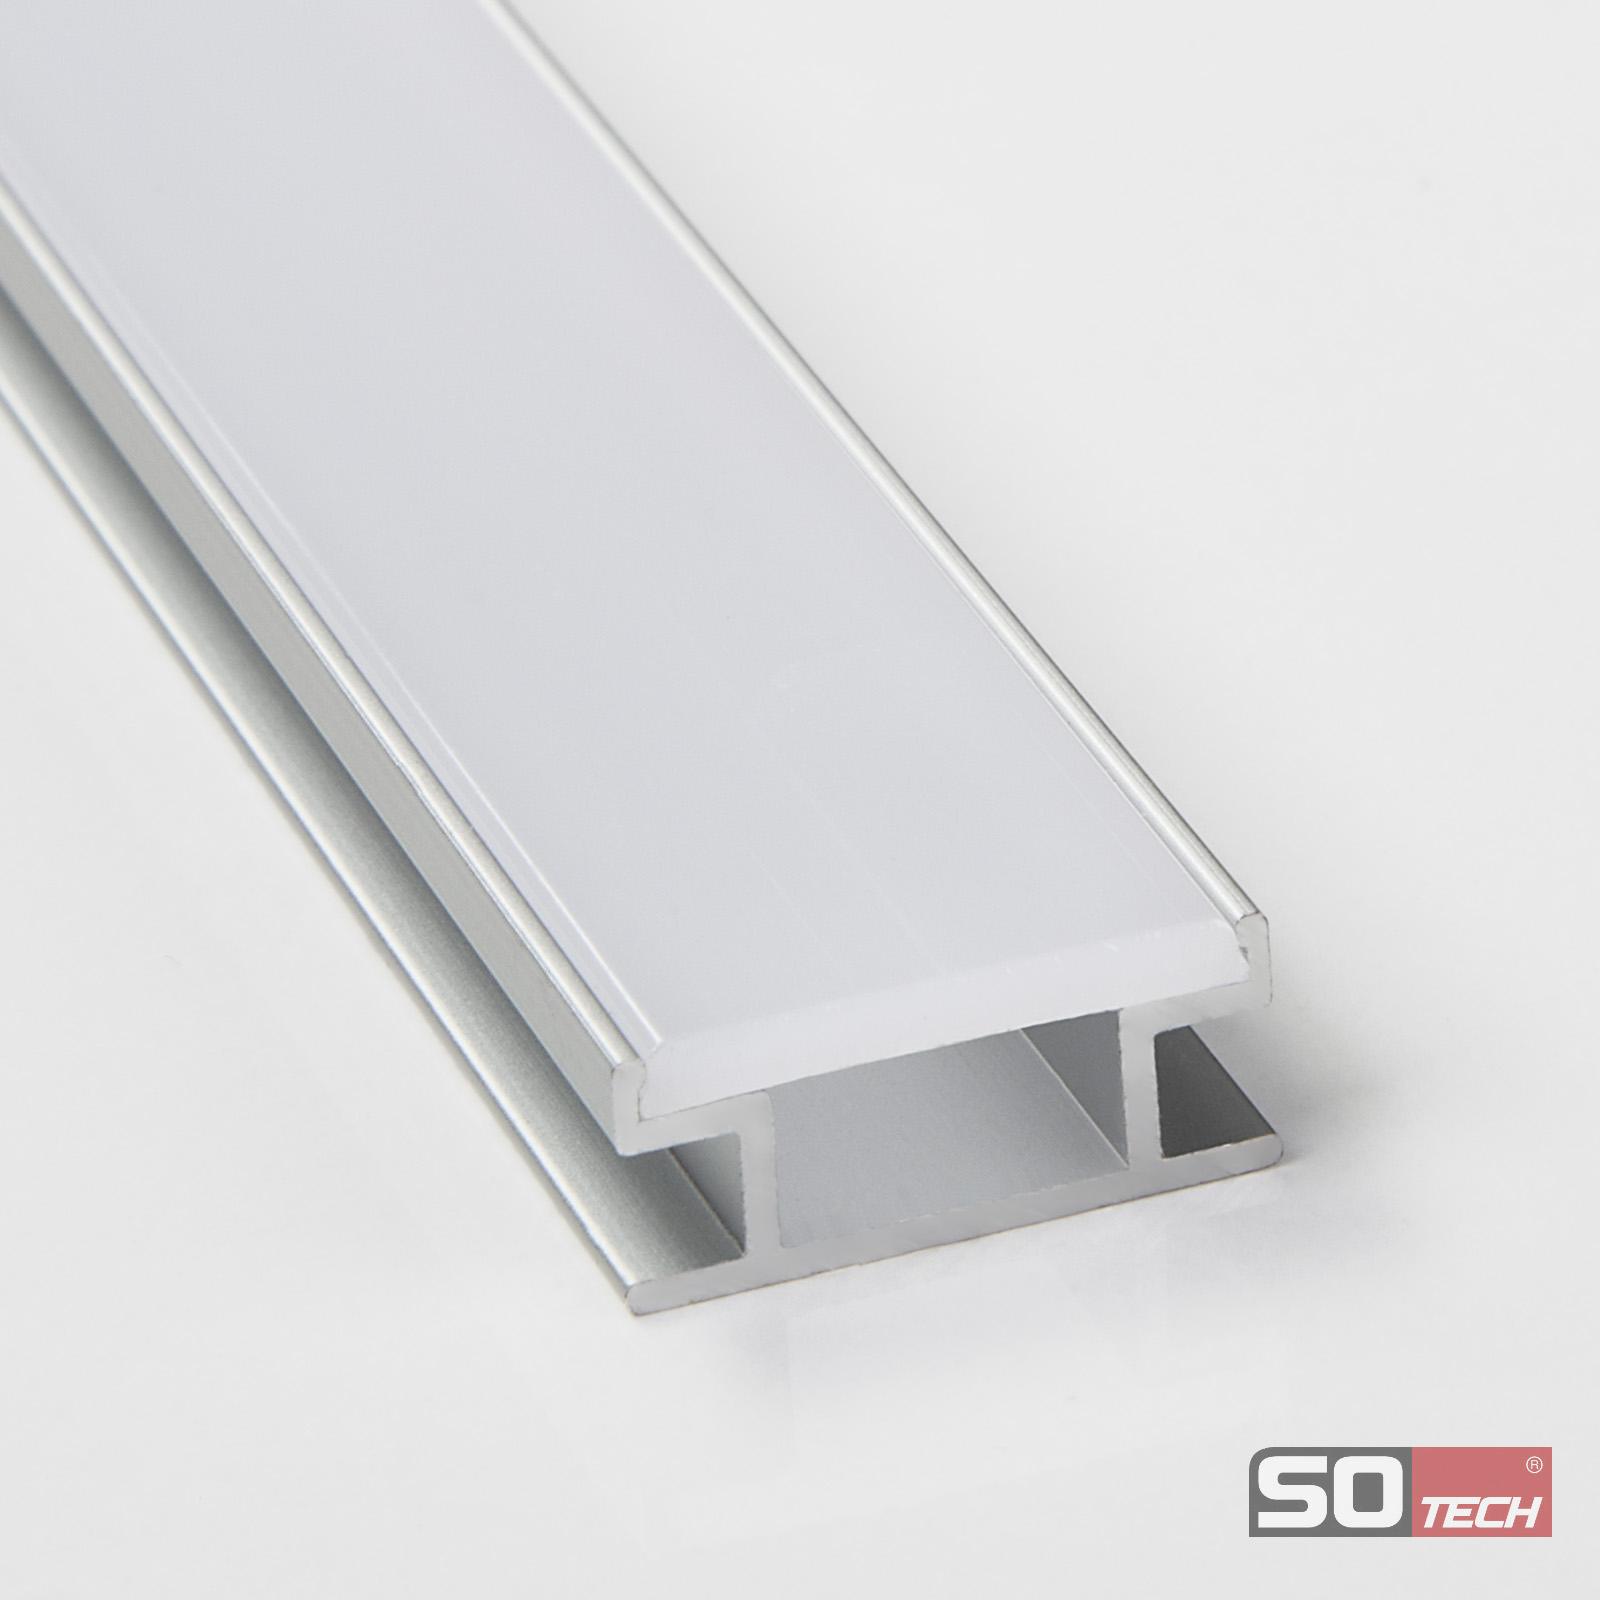 so tech alu aluminium led profil schiene f led stripe abdeckung opal o klar ebay. Black Bedroom Furniture Sets. Home Design Ideas